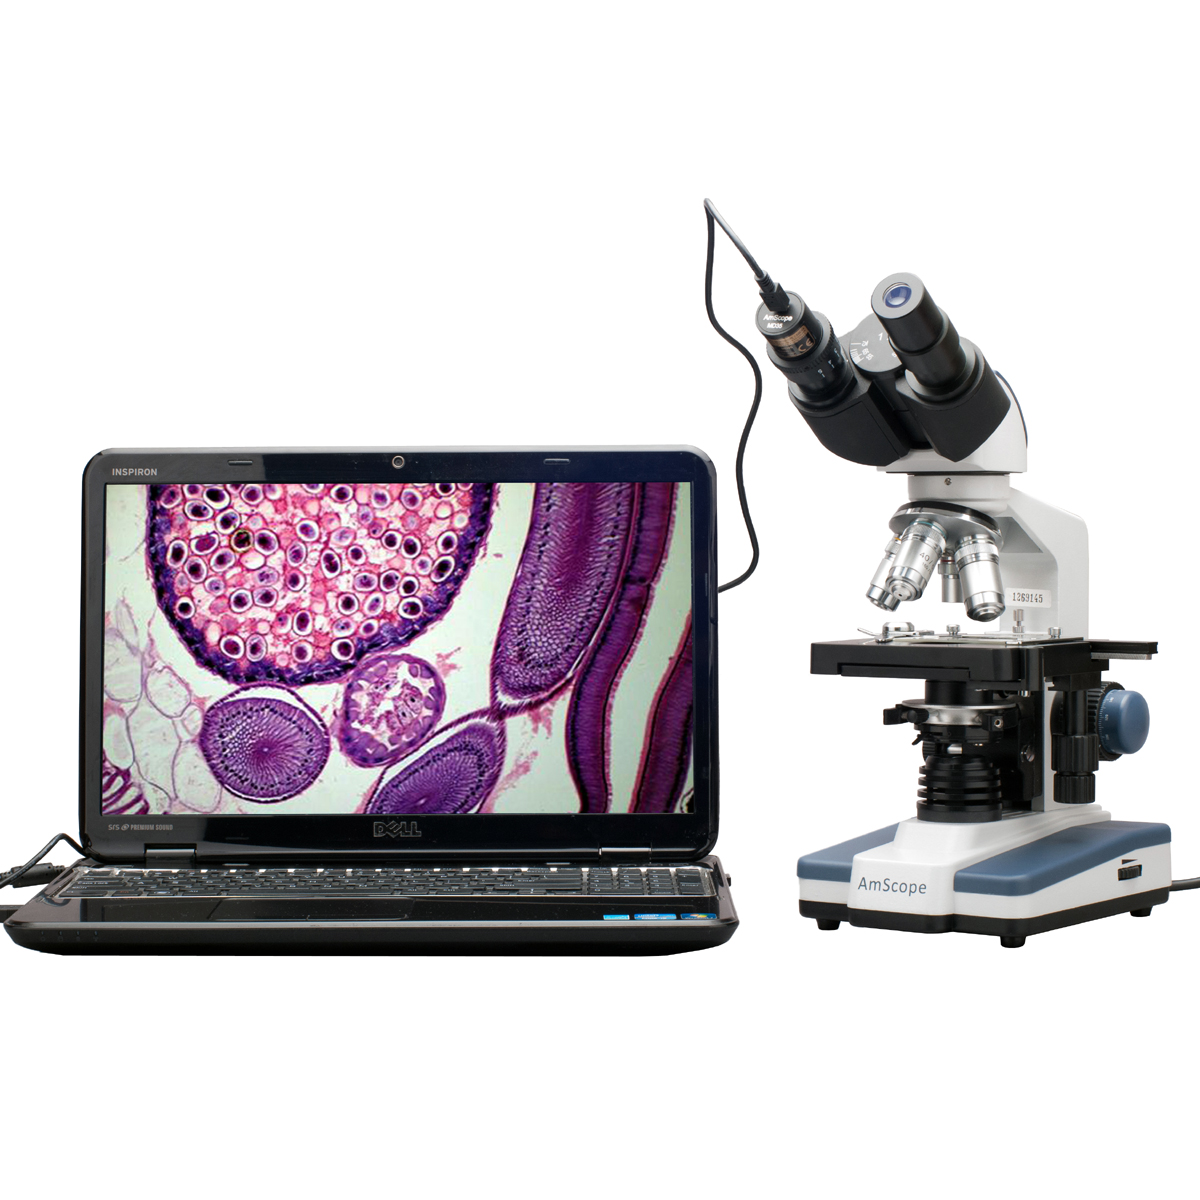 AmScope 40X-2000X LED Digital Binocular Compound Microsco...